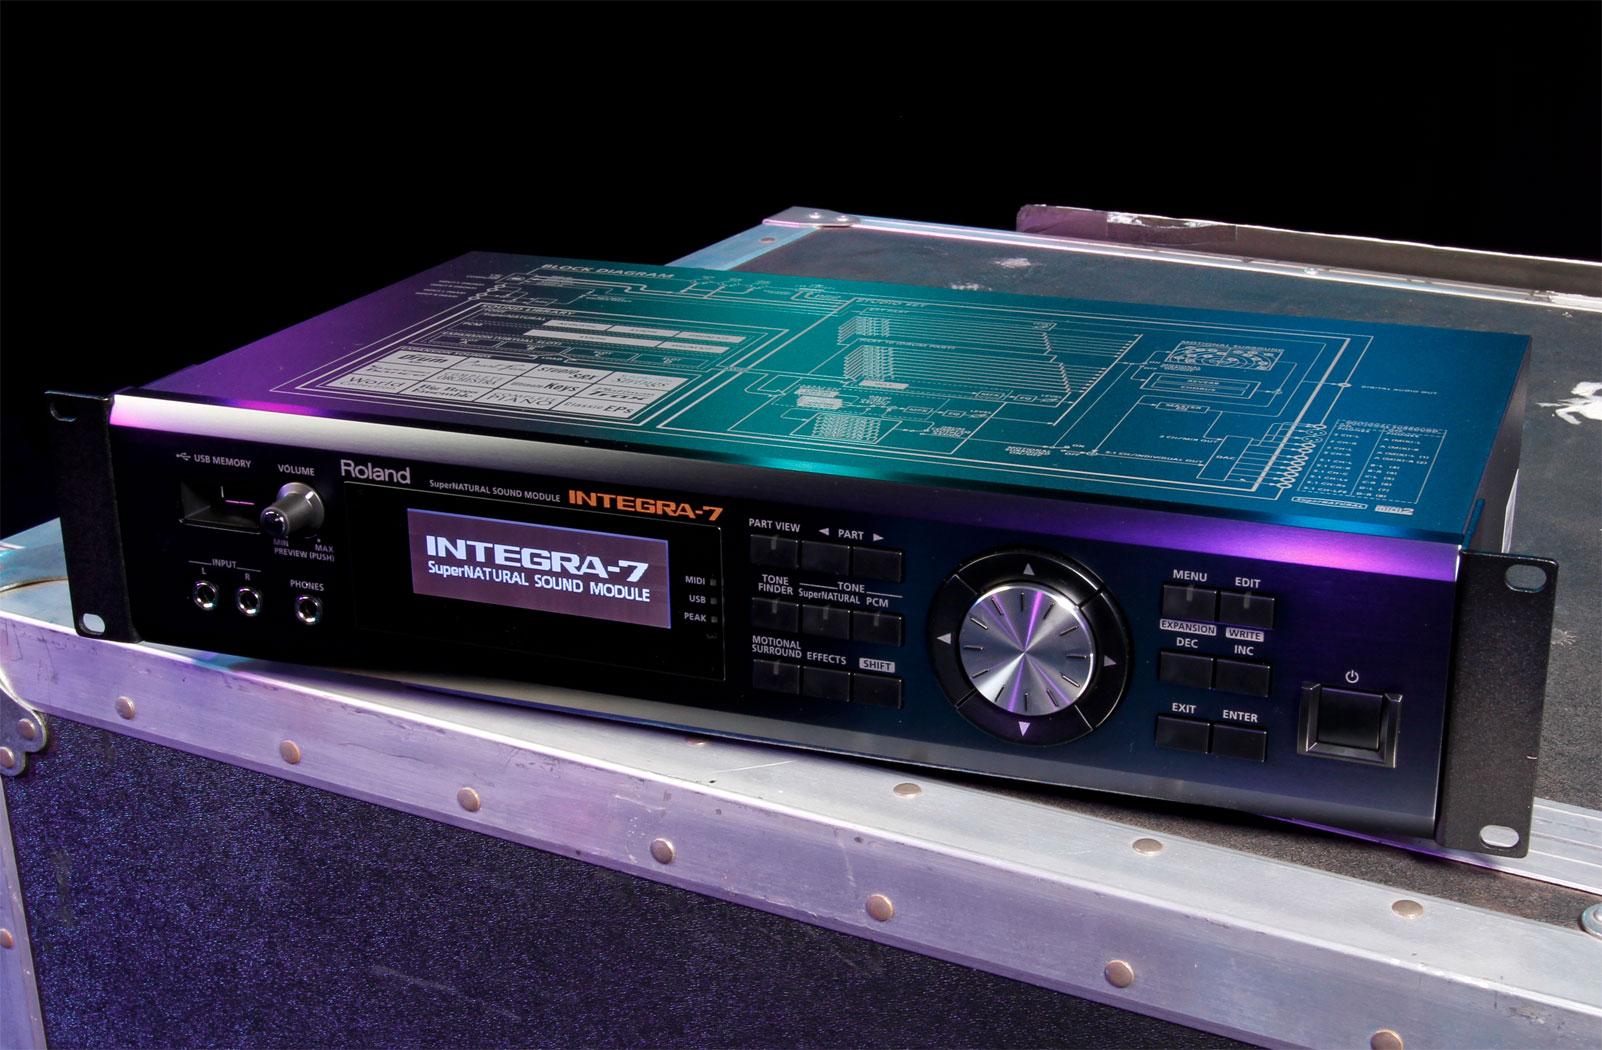 Roland Integra 7 Supernatural Sound Module